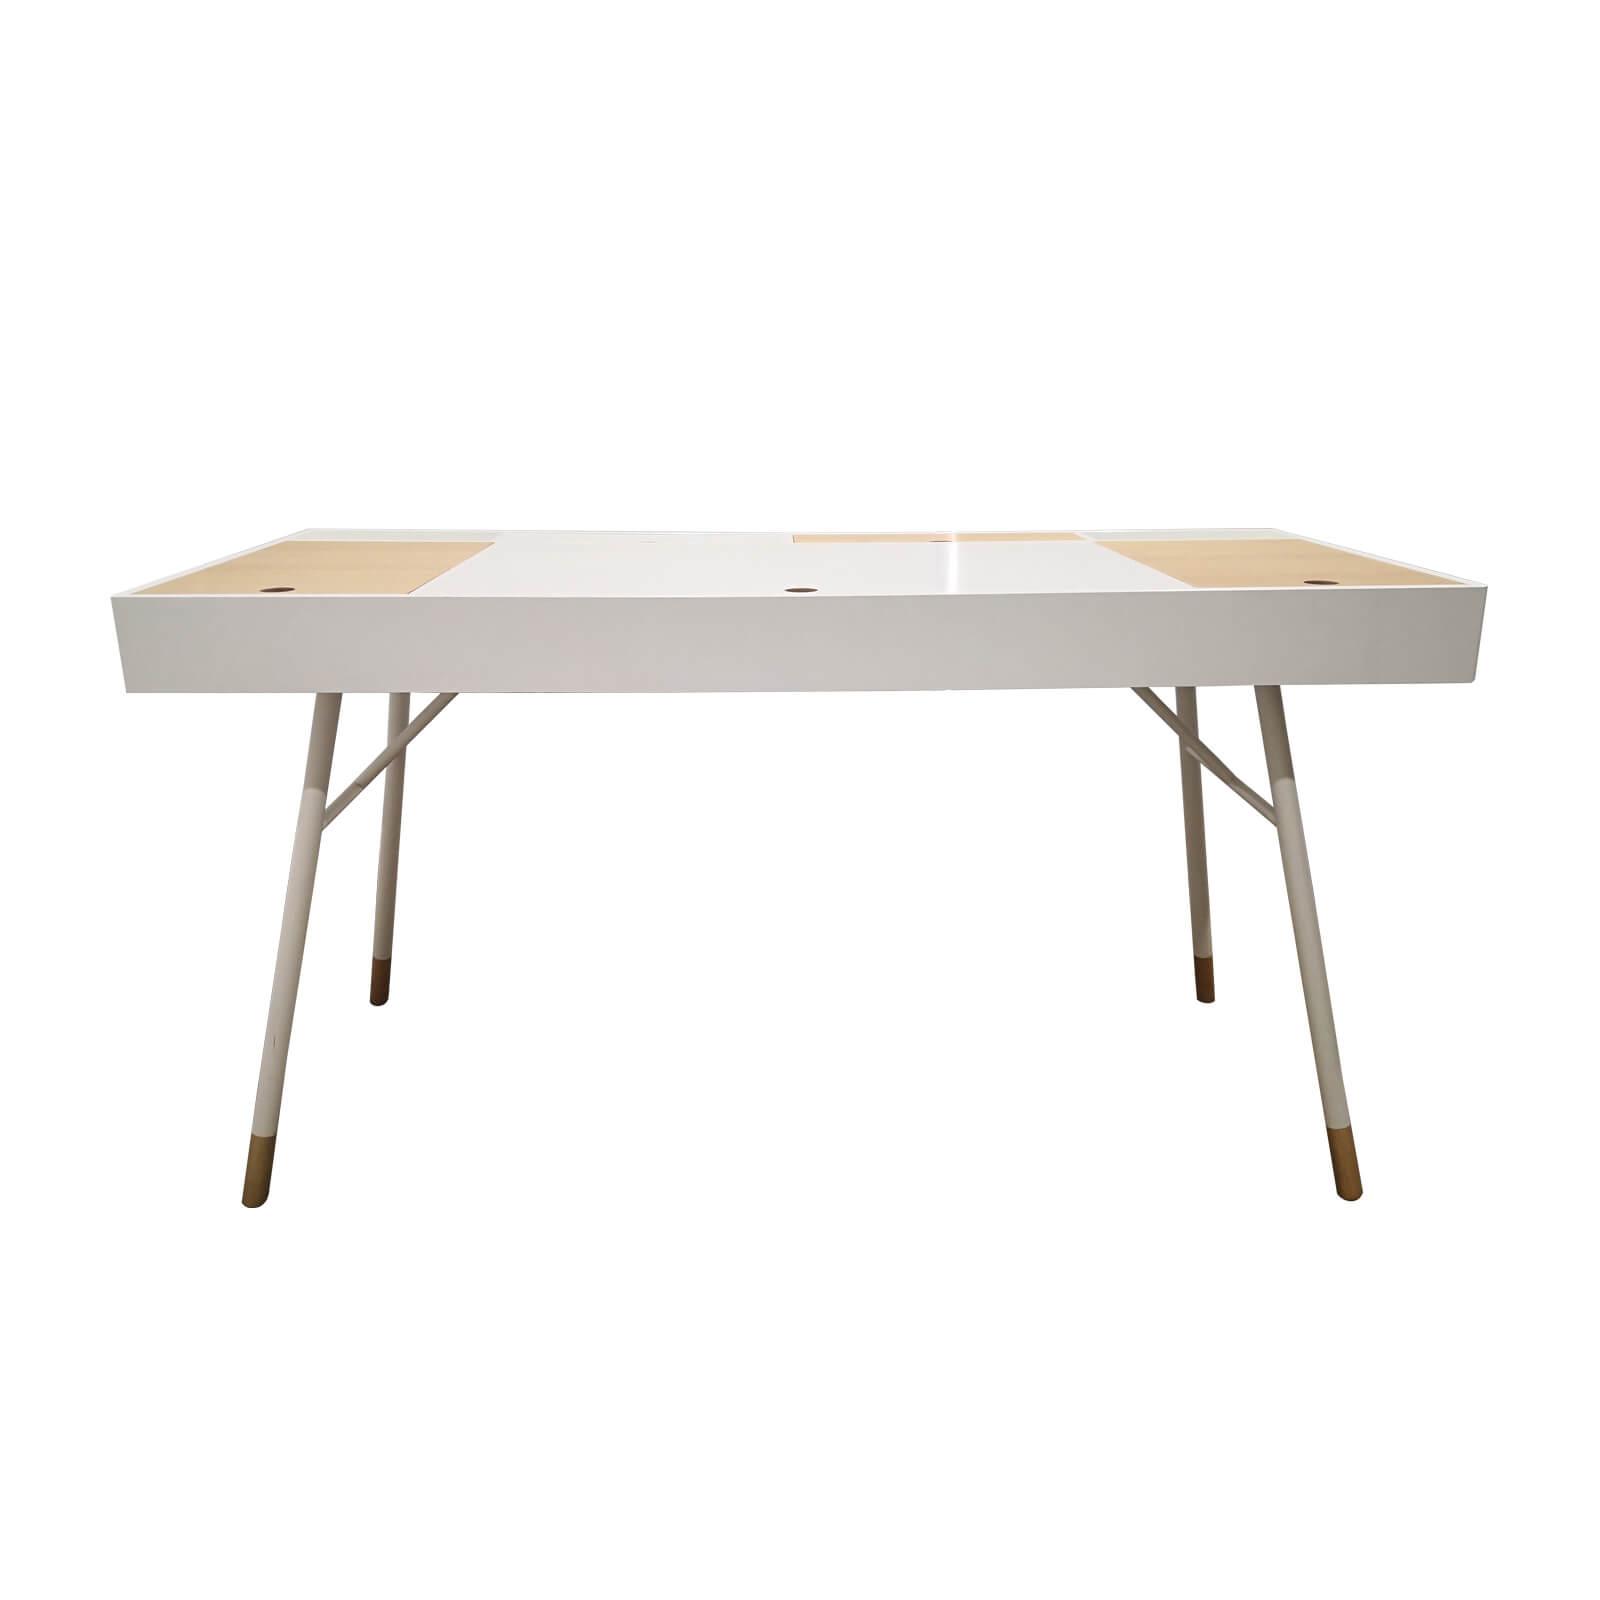 Two Design Lovers Bo Concept desk